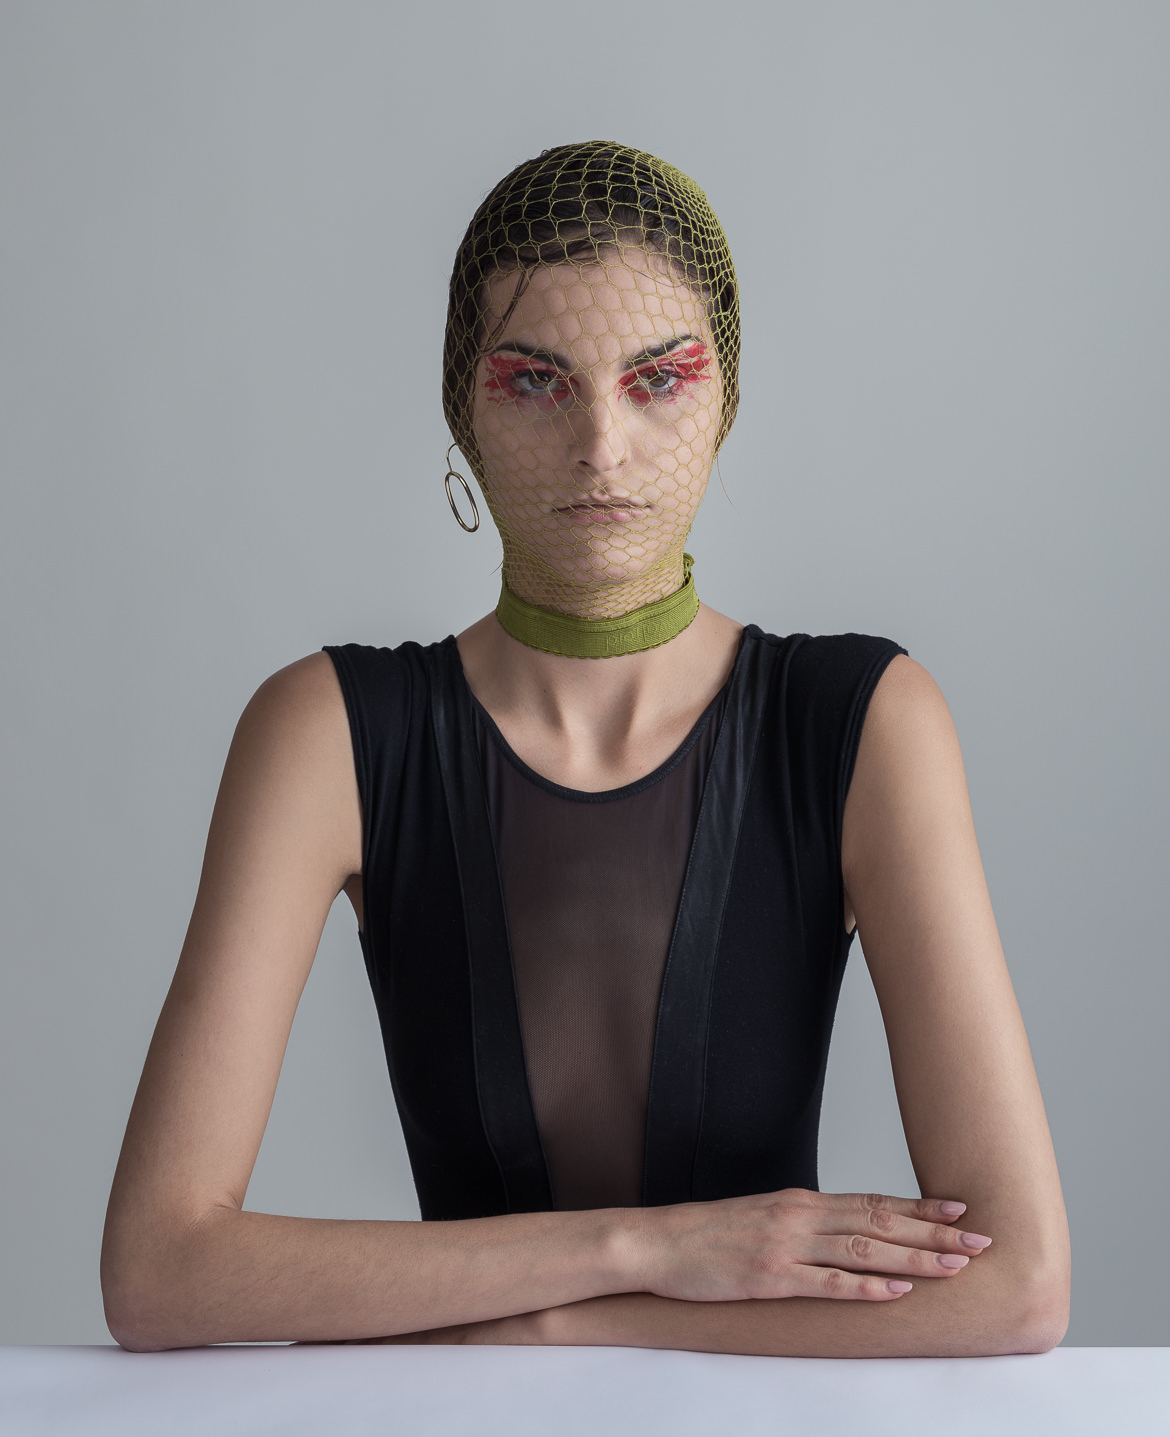 Kurt Remling Beauty Fotograf Anja Platzer SAD (1)1